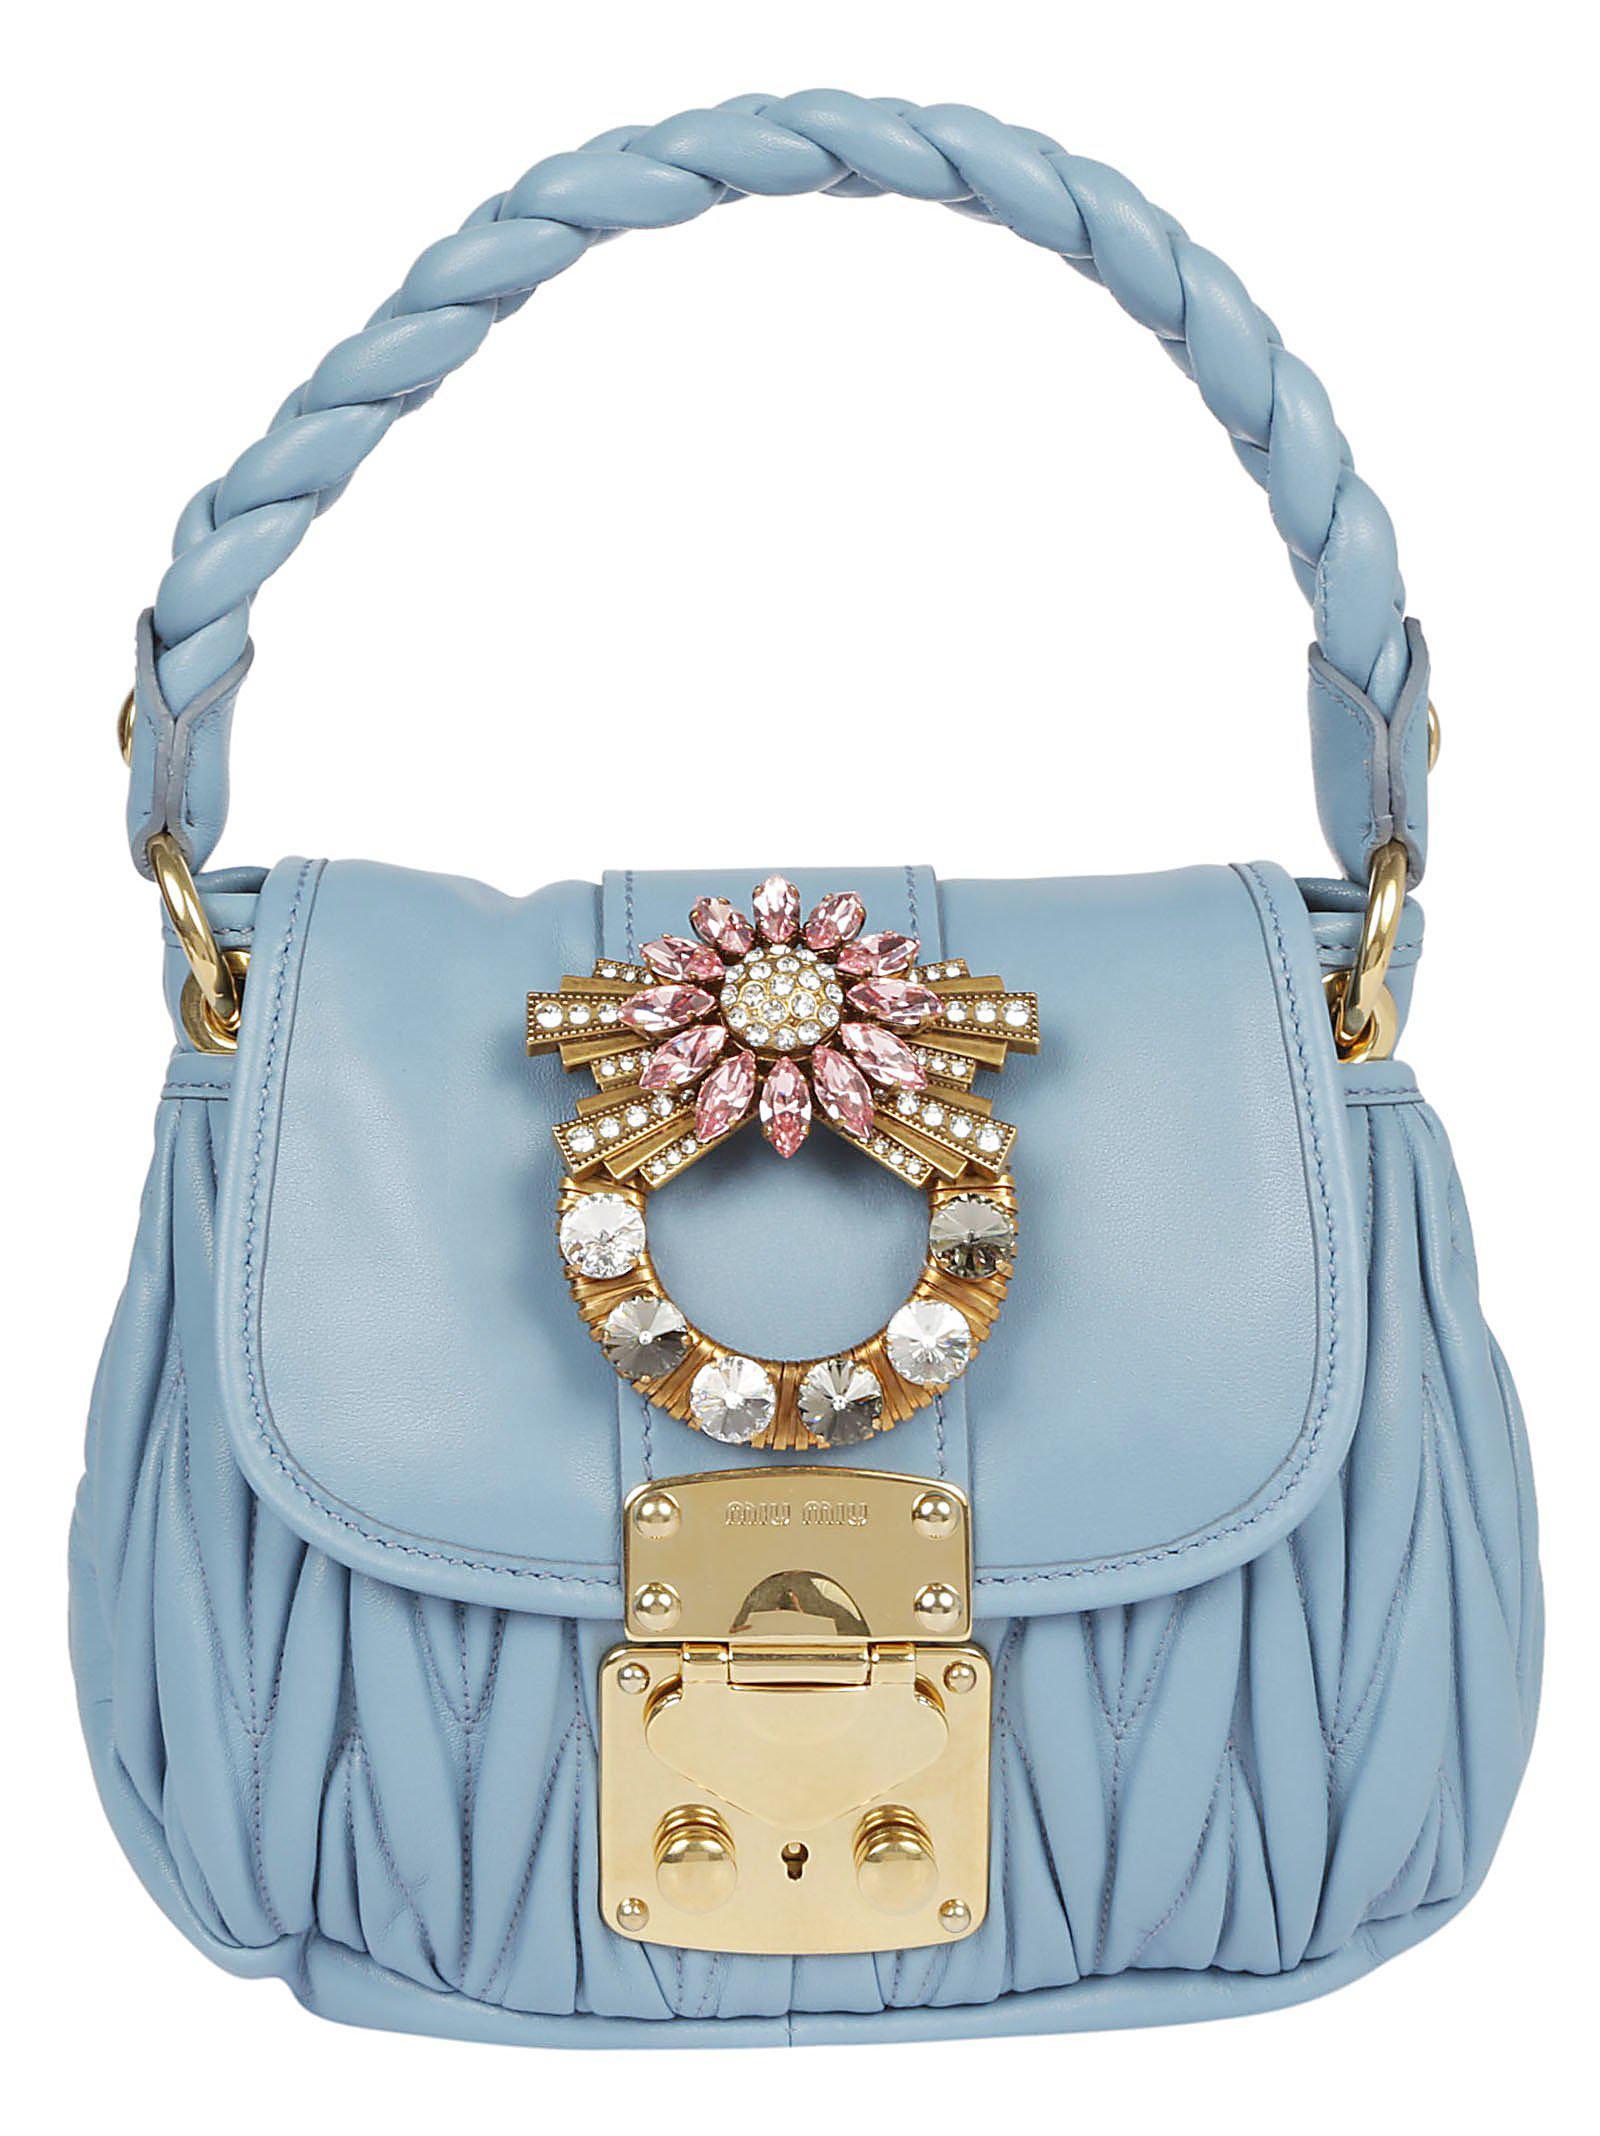 791d5504eeed Miu Miu Mini Matelassé Tote Bag in Blue - Lyst